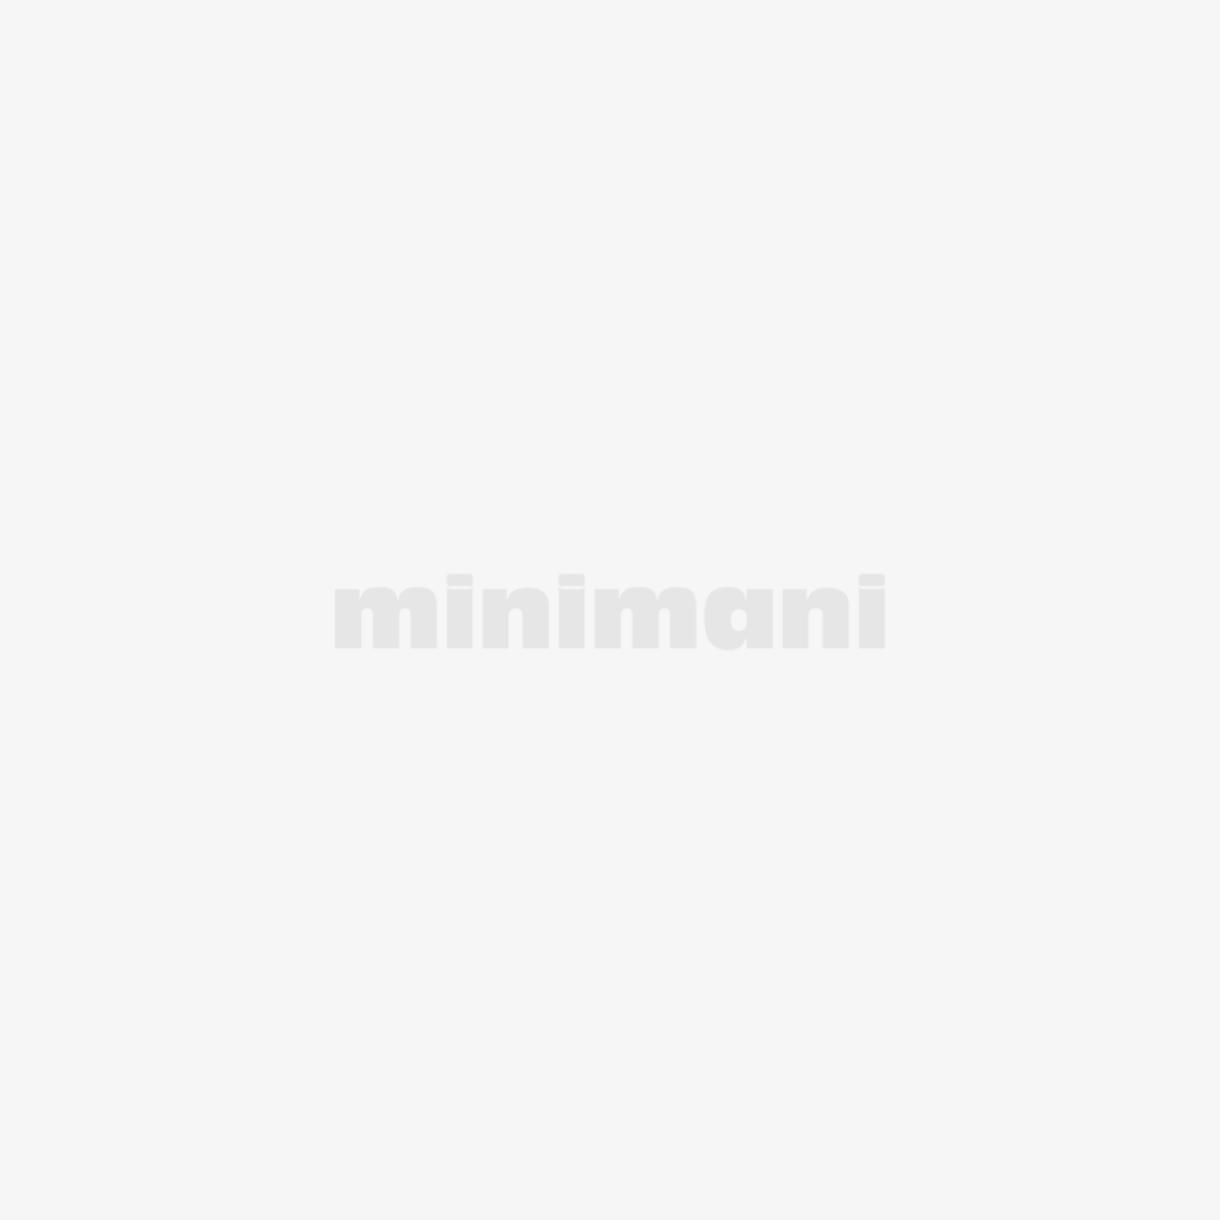 SWIM&FUN UIMA-ALTAAN PIKAKLOORIJAUHE 5 KG